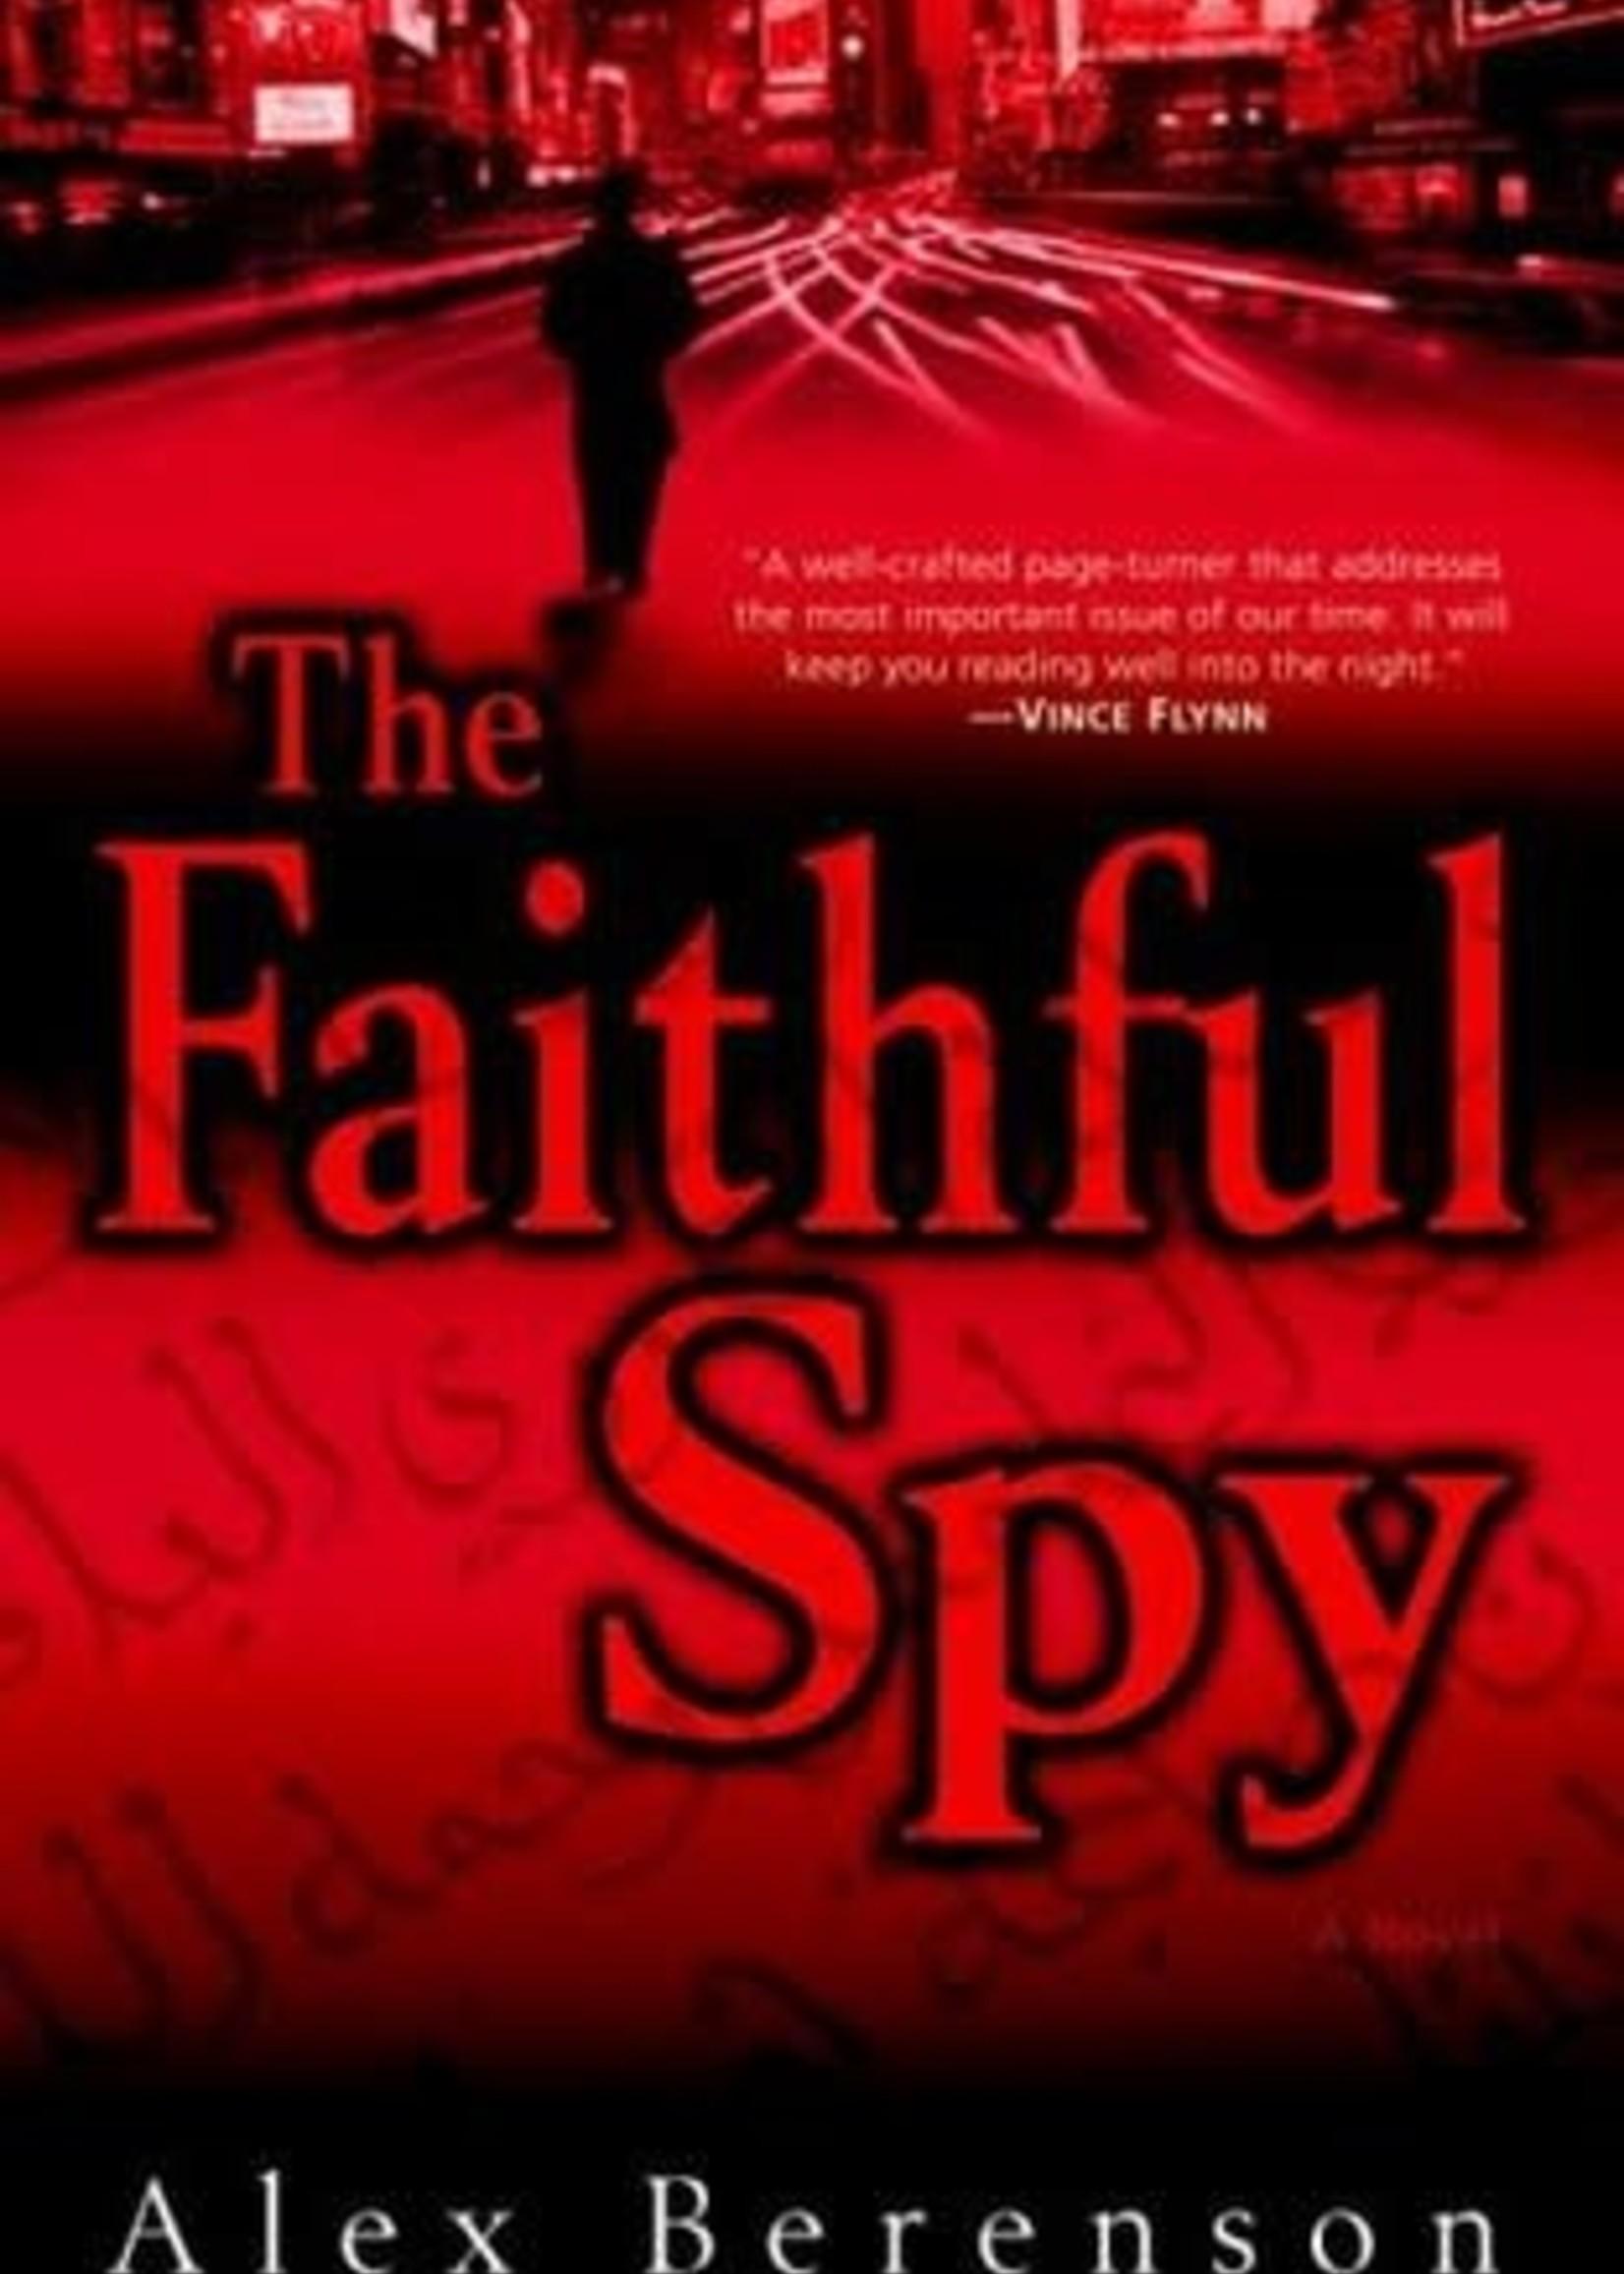 USED - The Faithful Spy by Alex Berenson